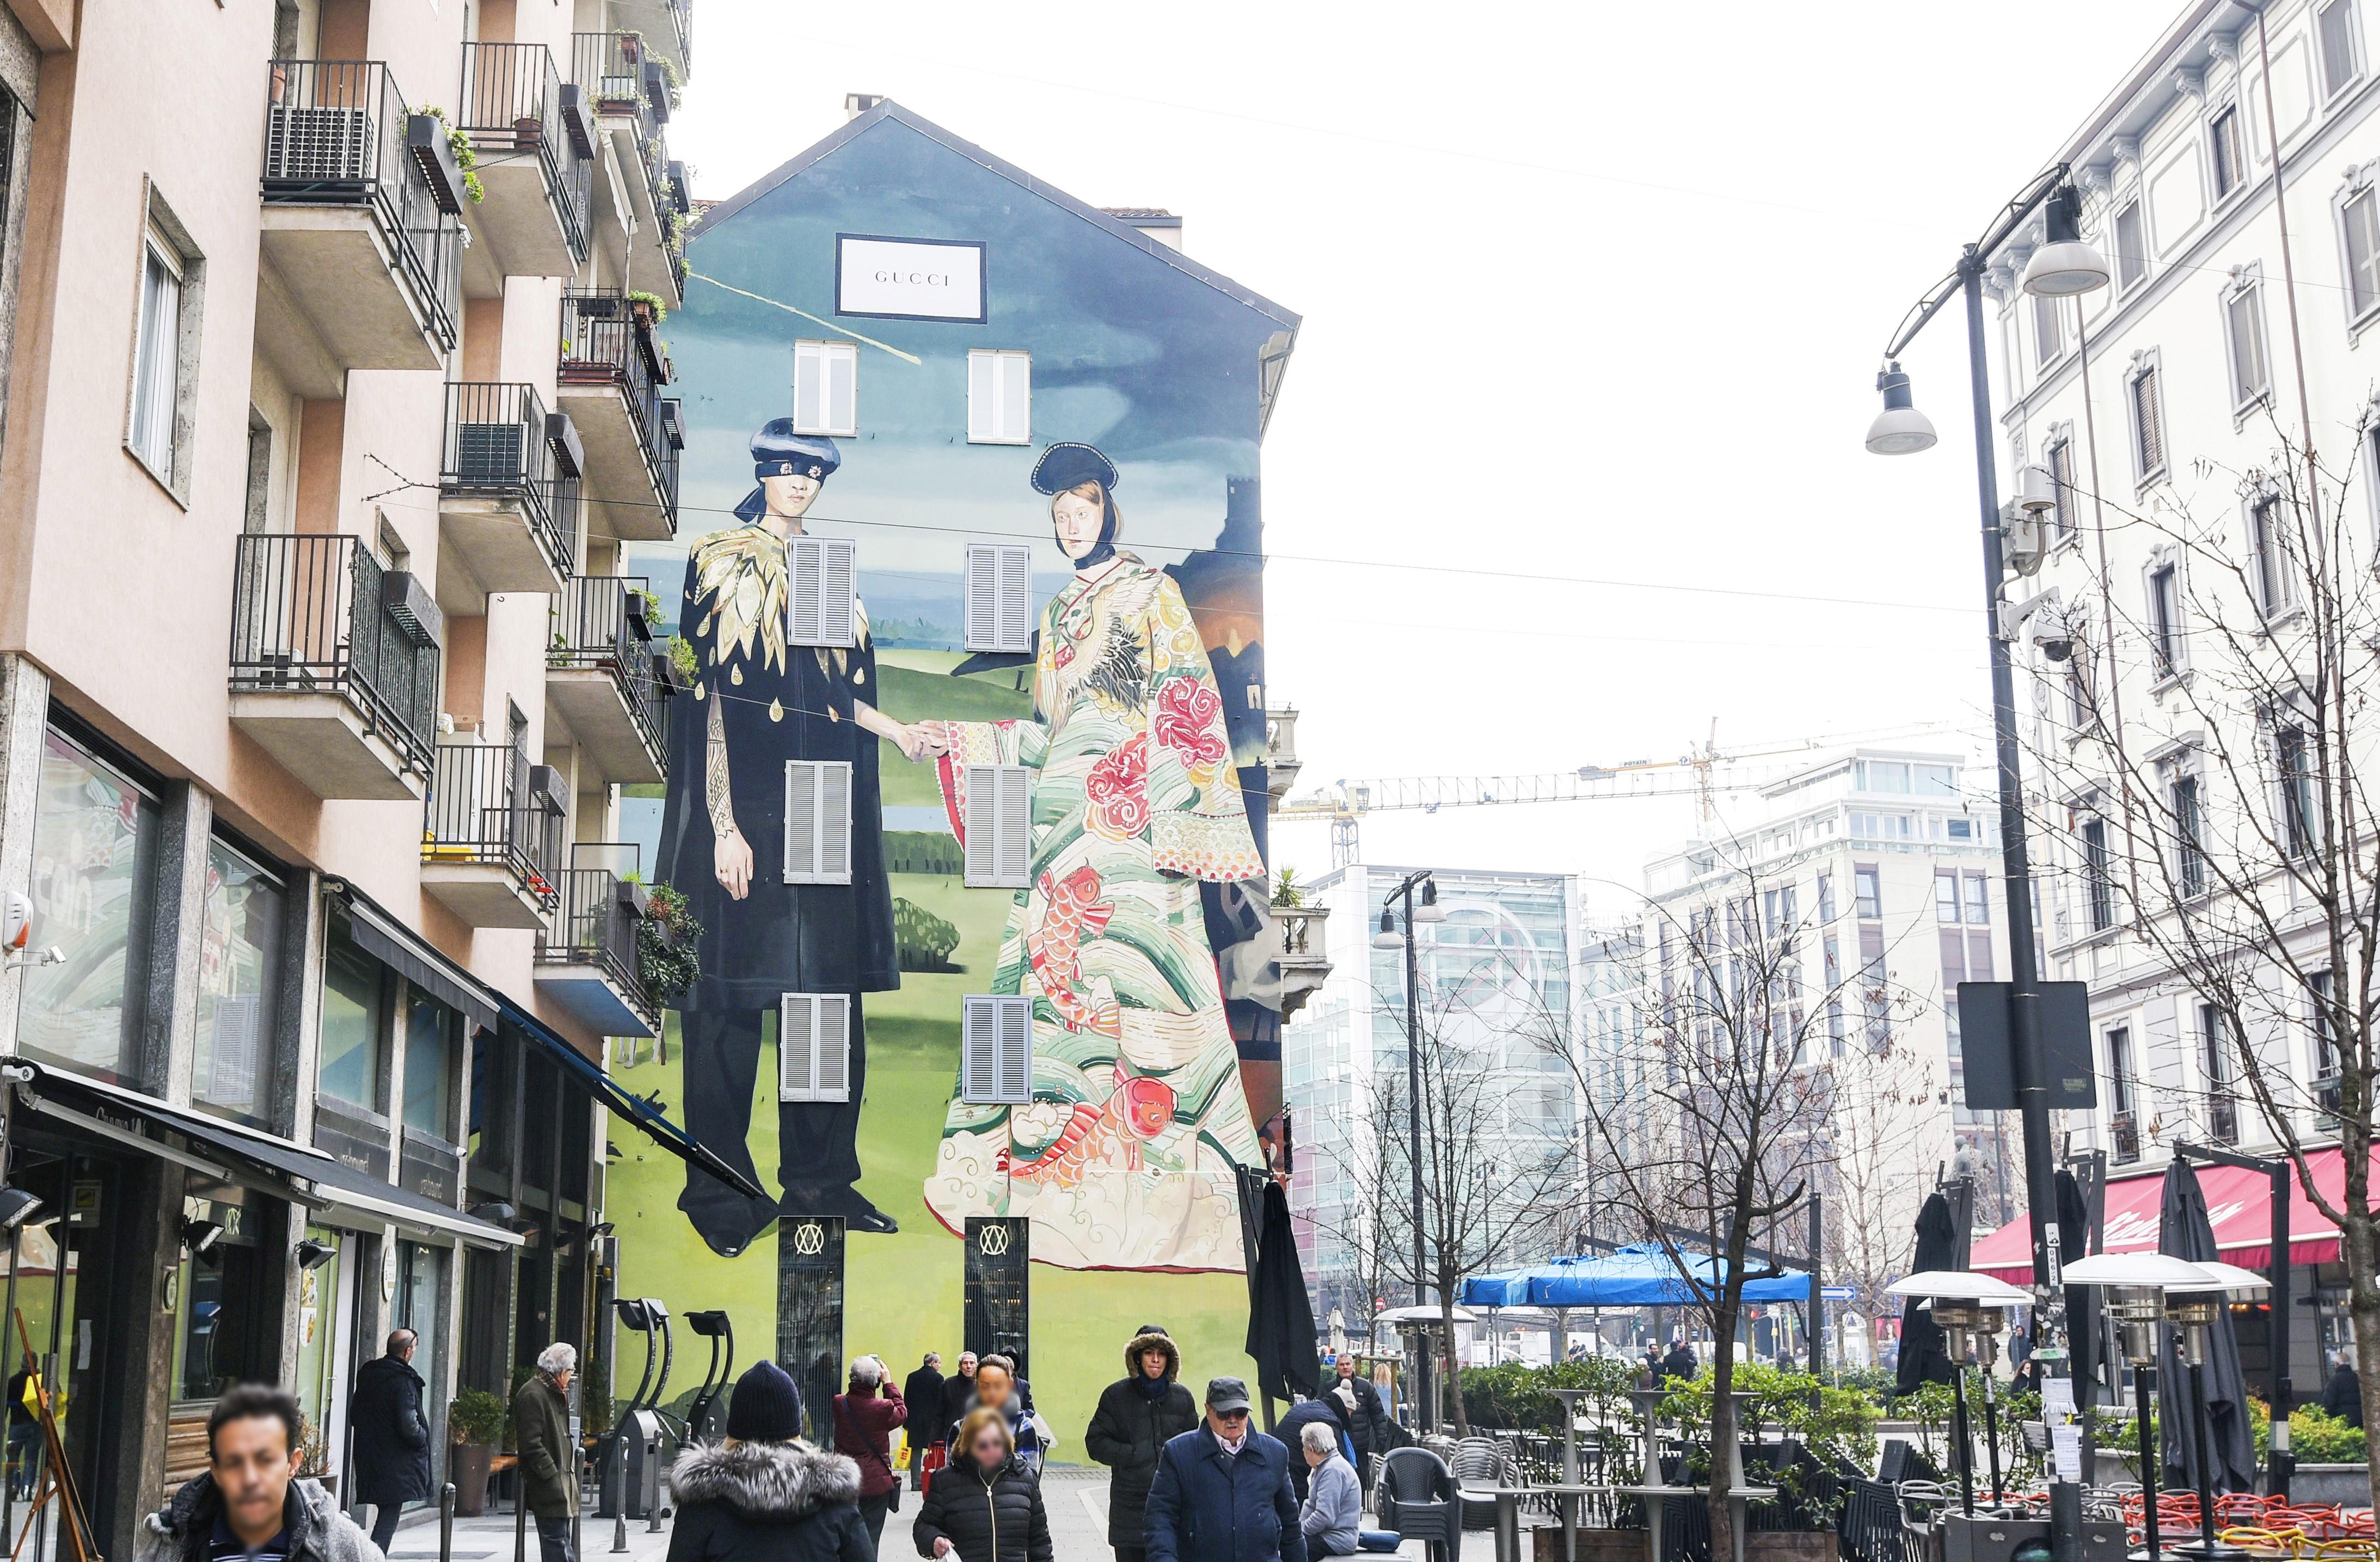 Gucci Art Wall_ Ignasi Monreal